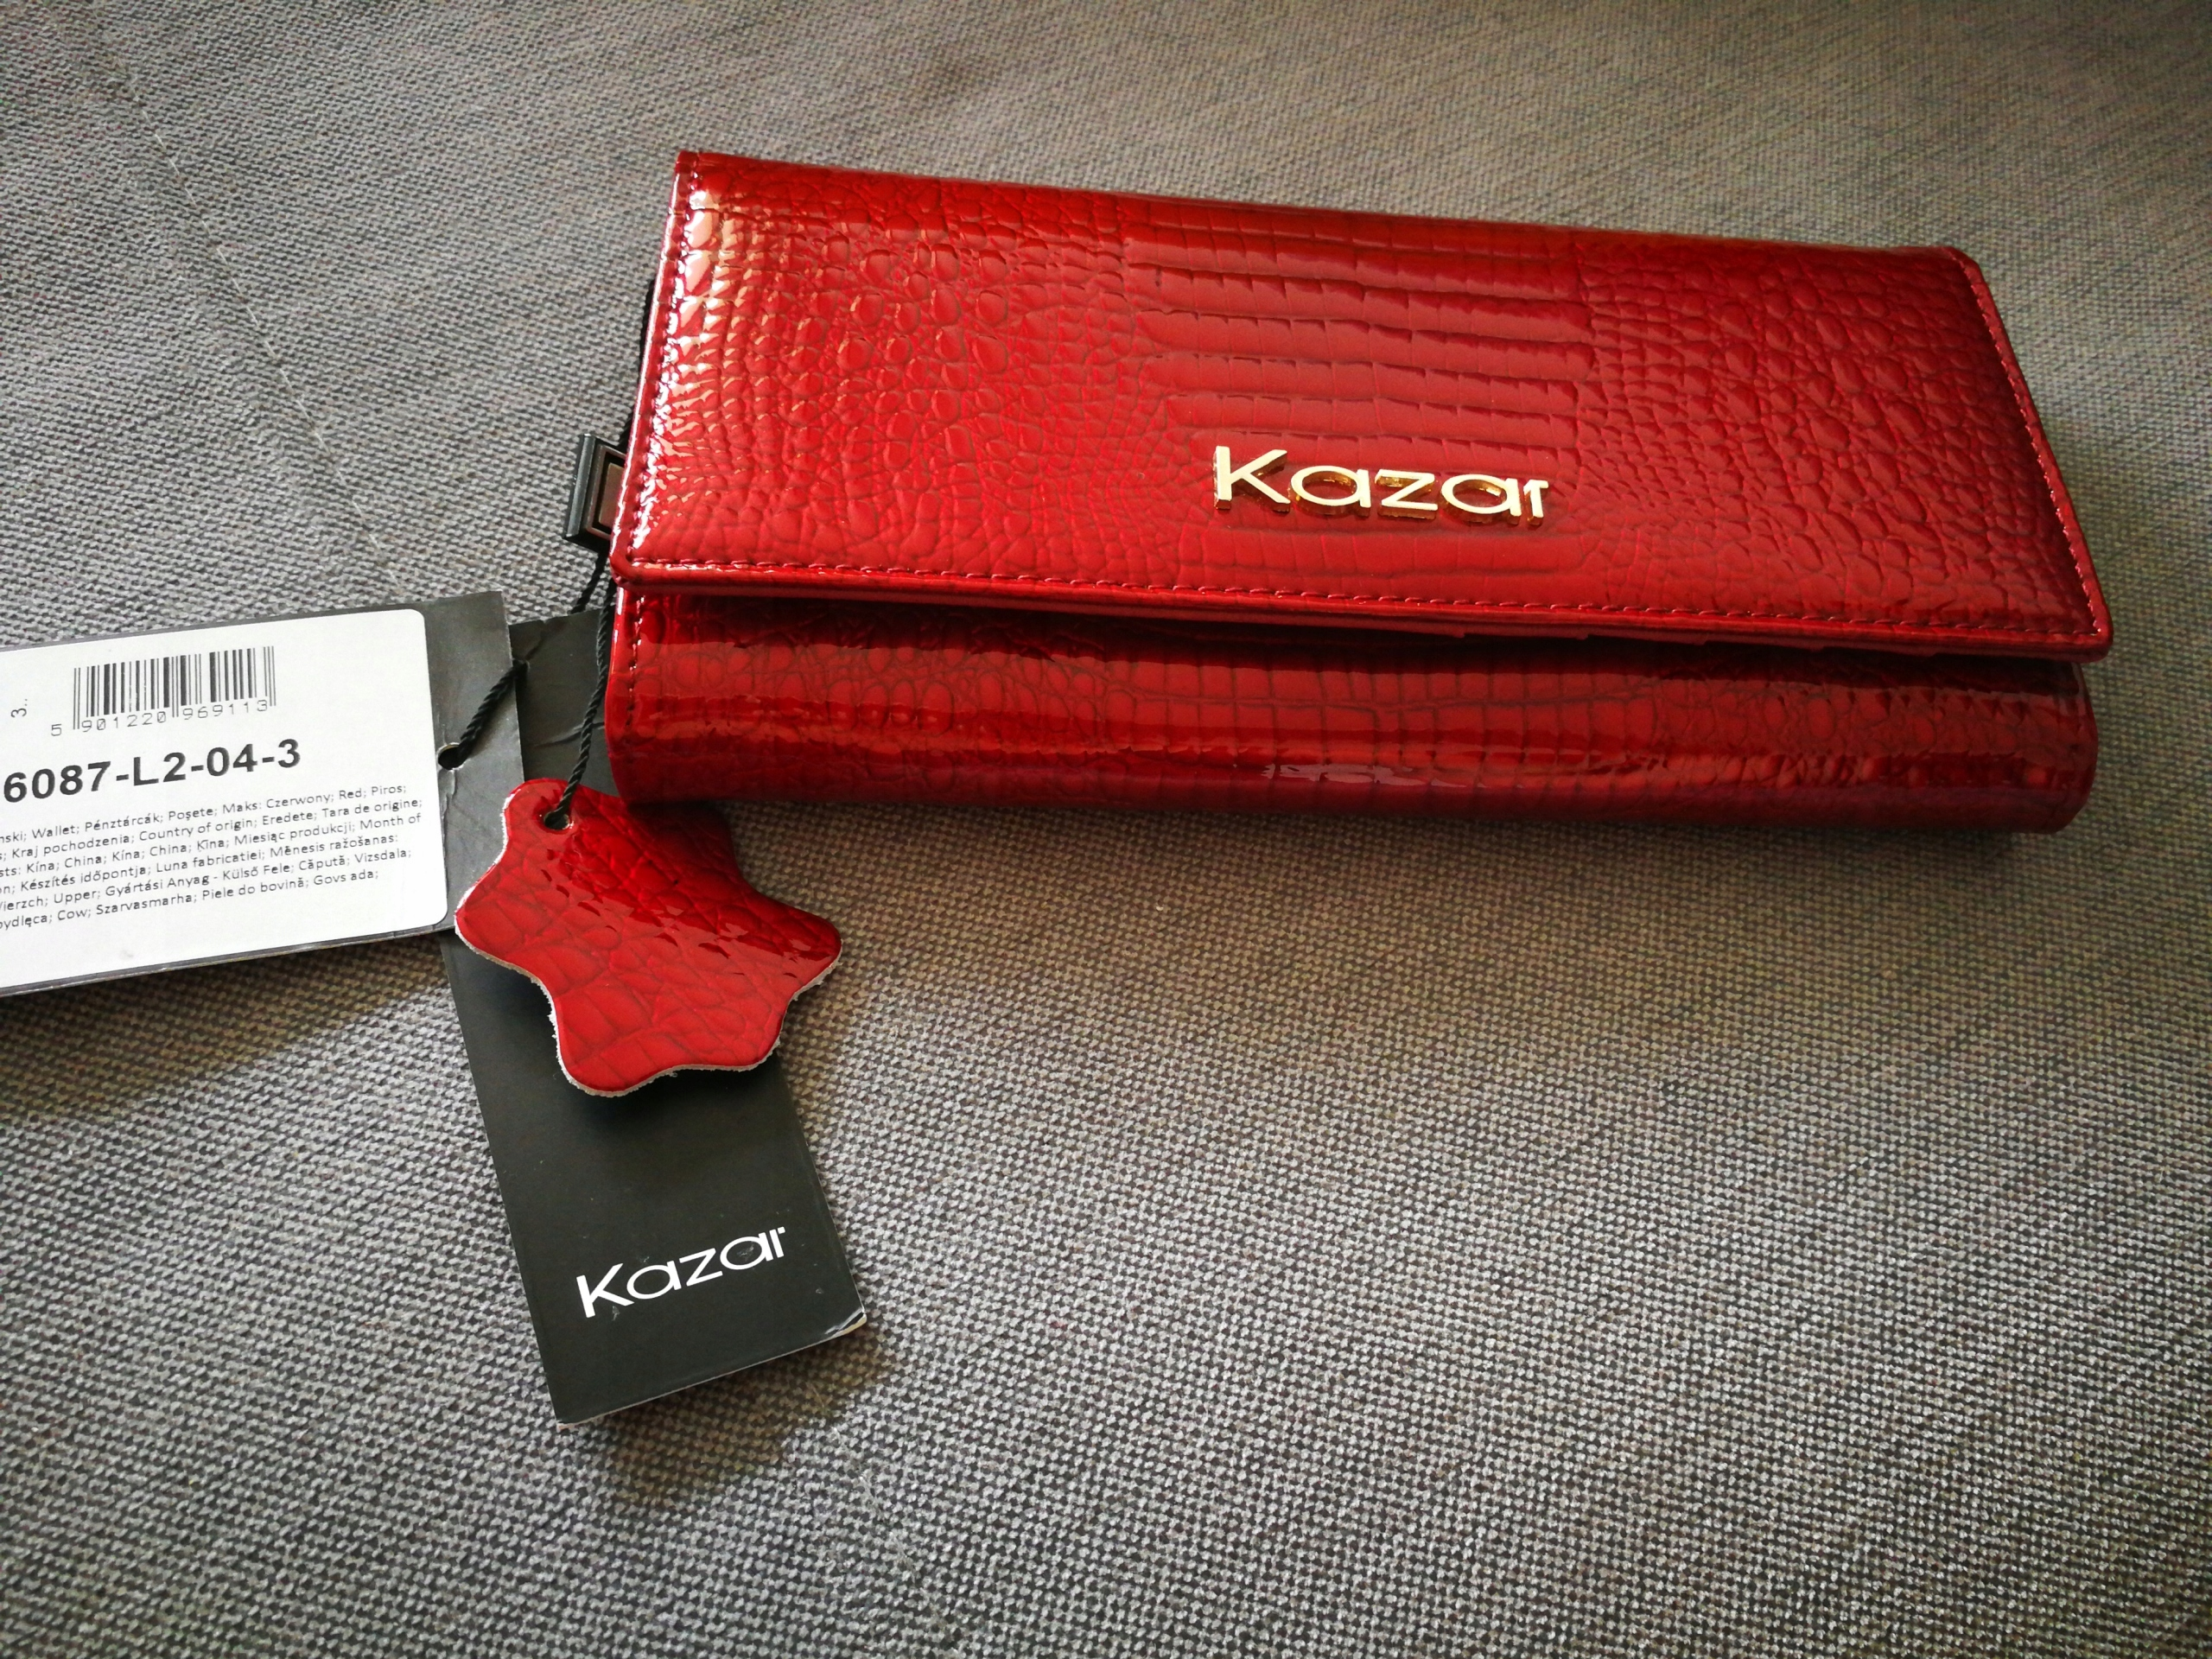 c1c2983aebacf portfel KAZAR Nowy model 16087-L2-04 - 7605228222 - oficjalne ...